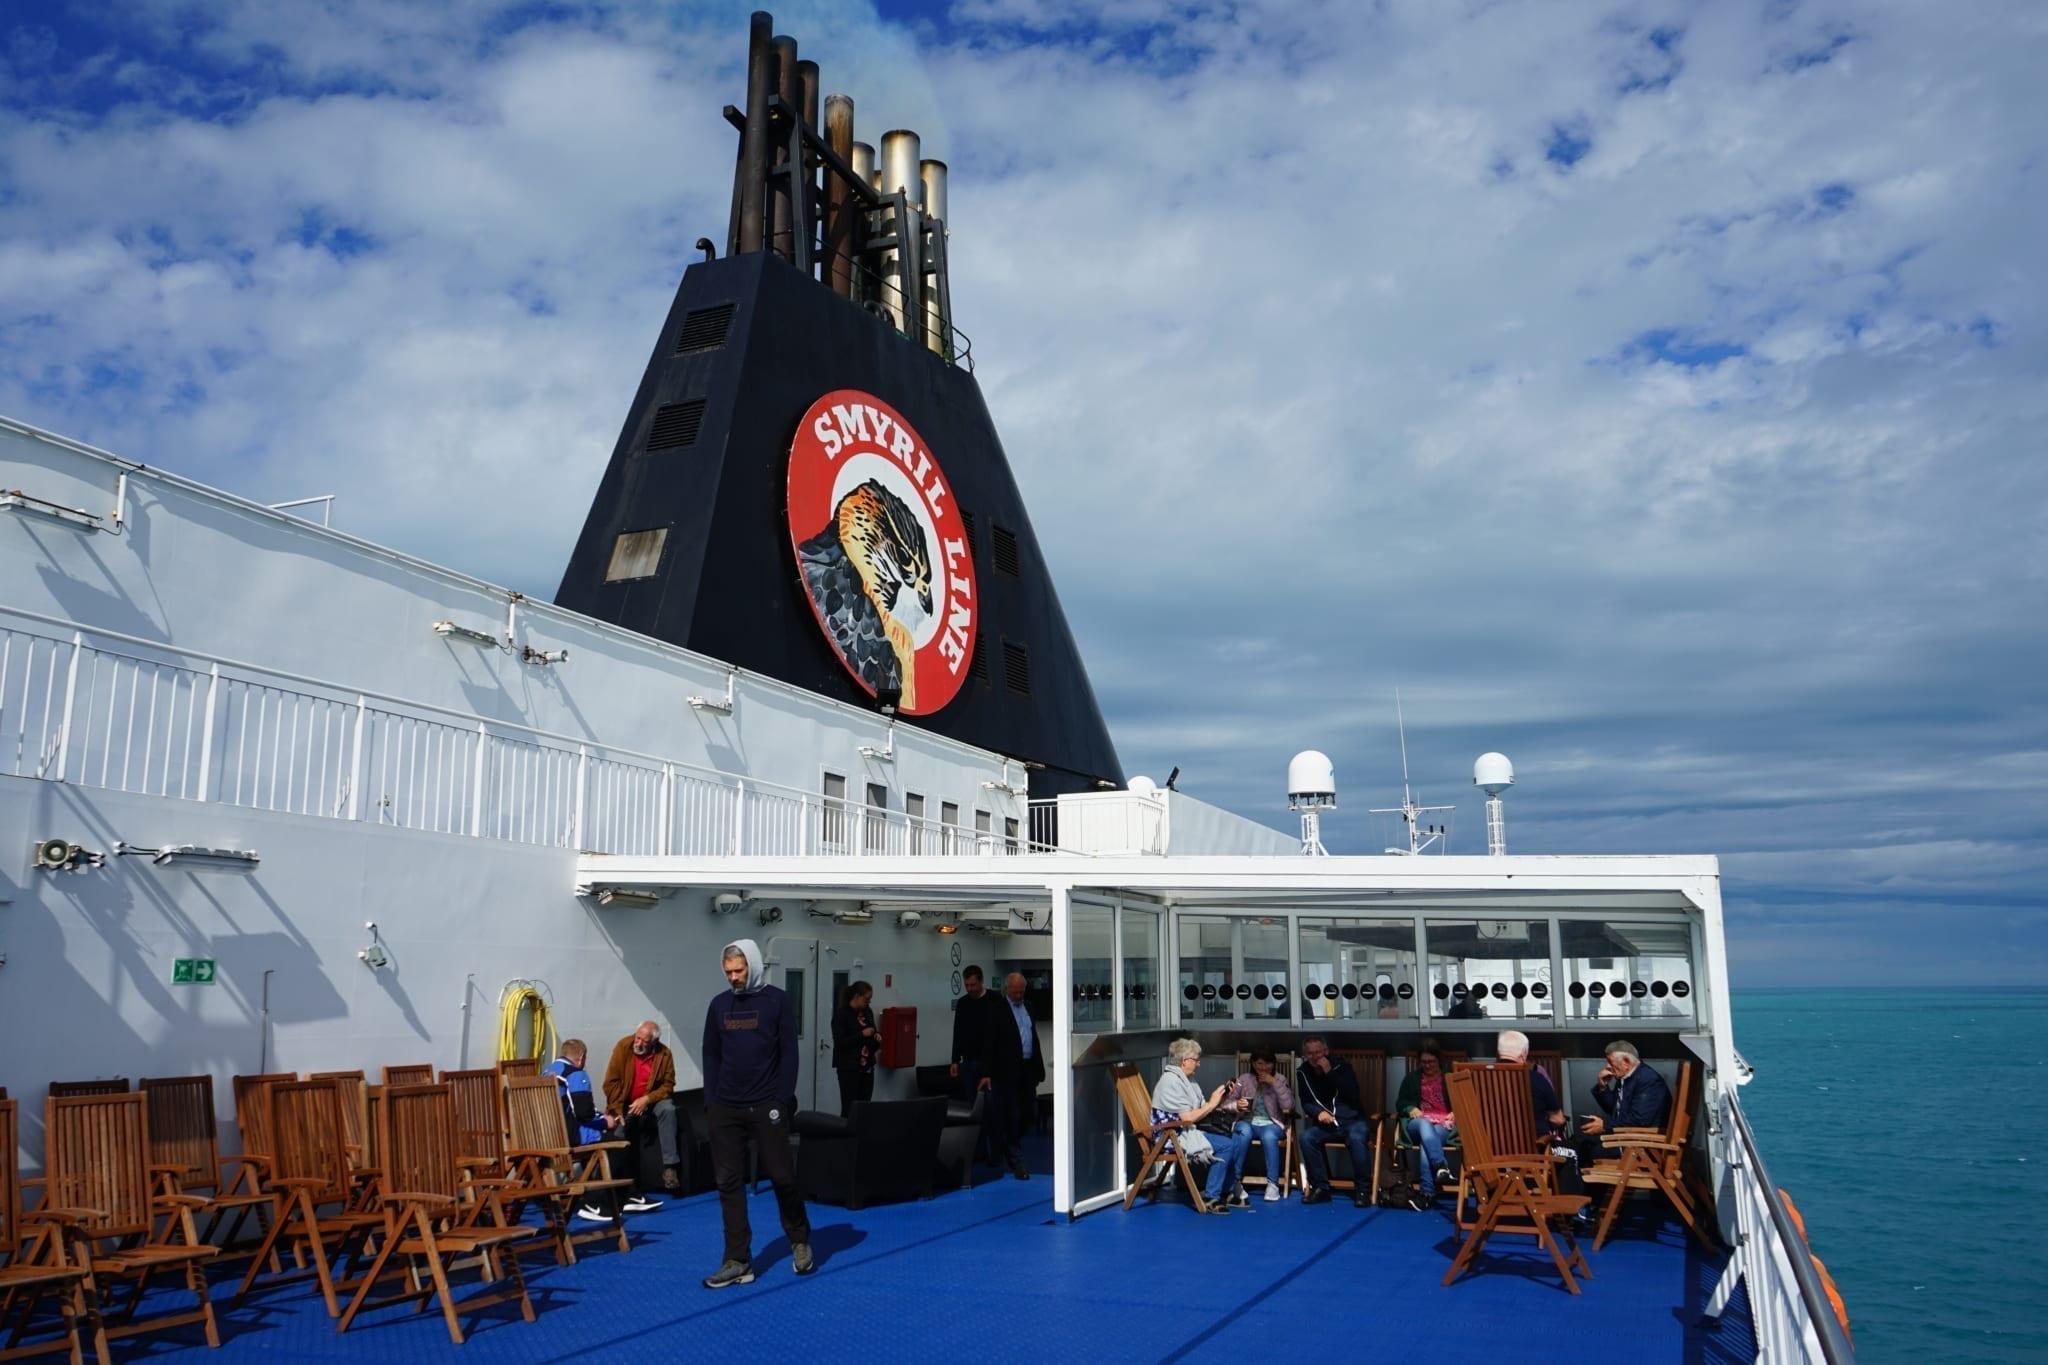 Sky Bar Norröna Smyril Line